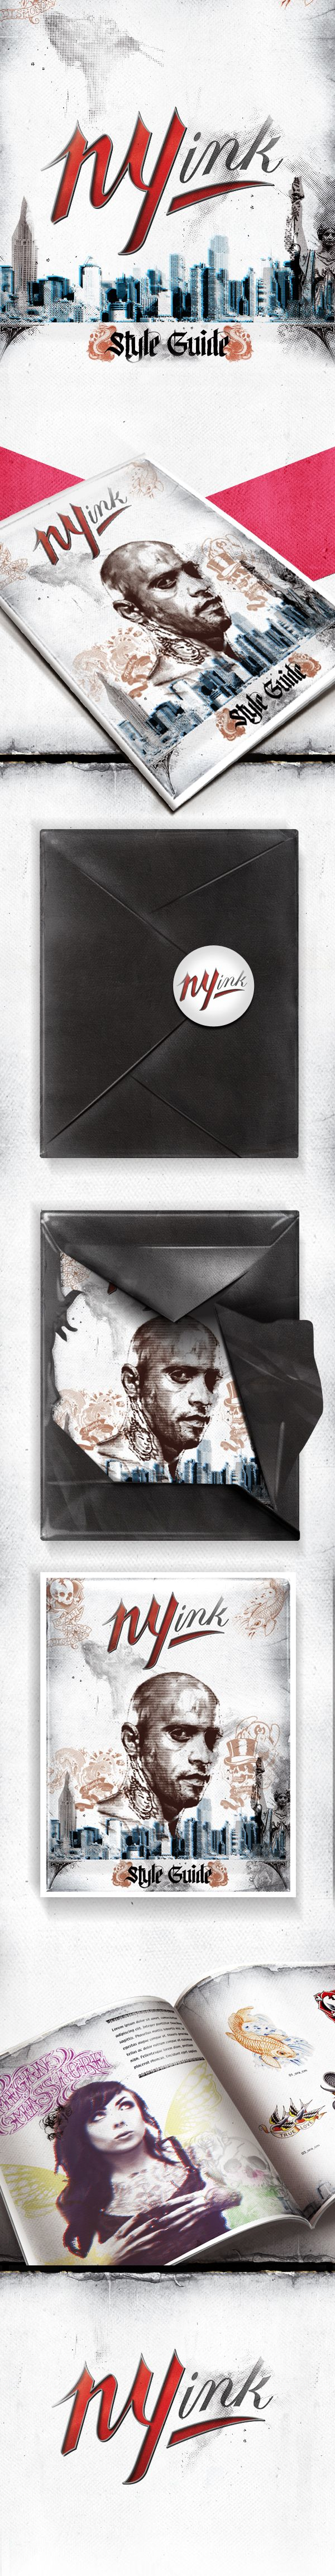 NY INK STYLEGUIDE by Leandro Lima, via Behance